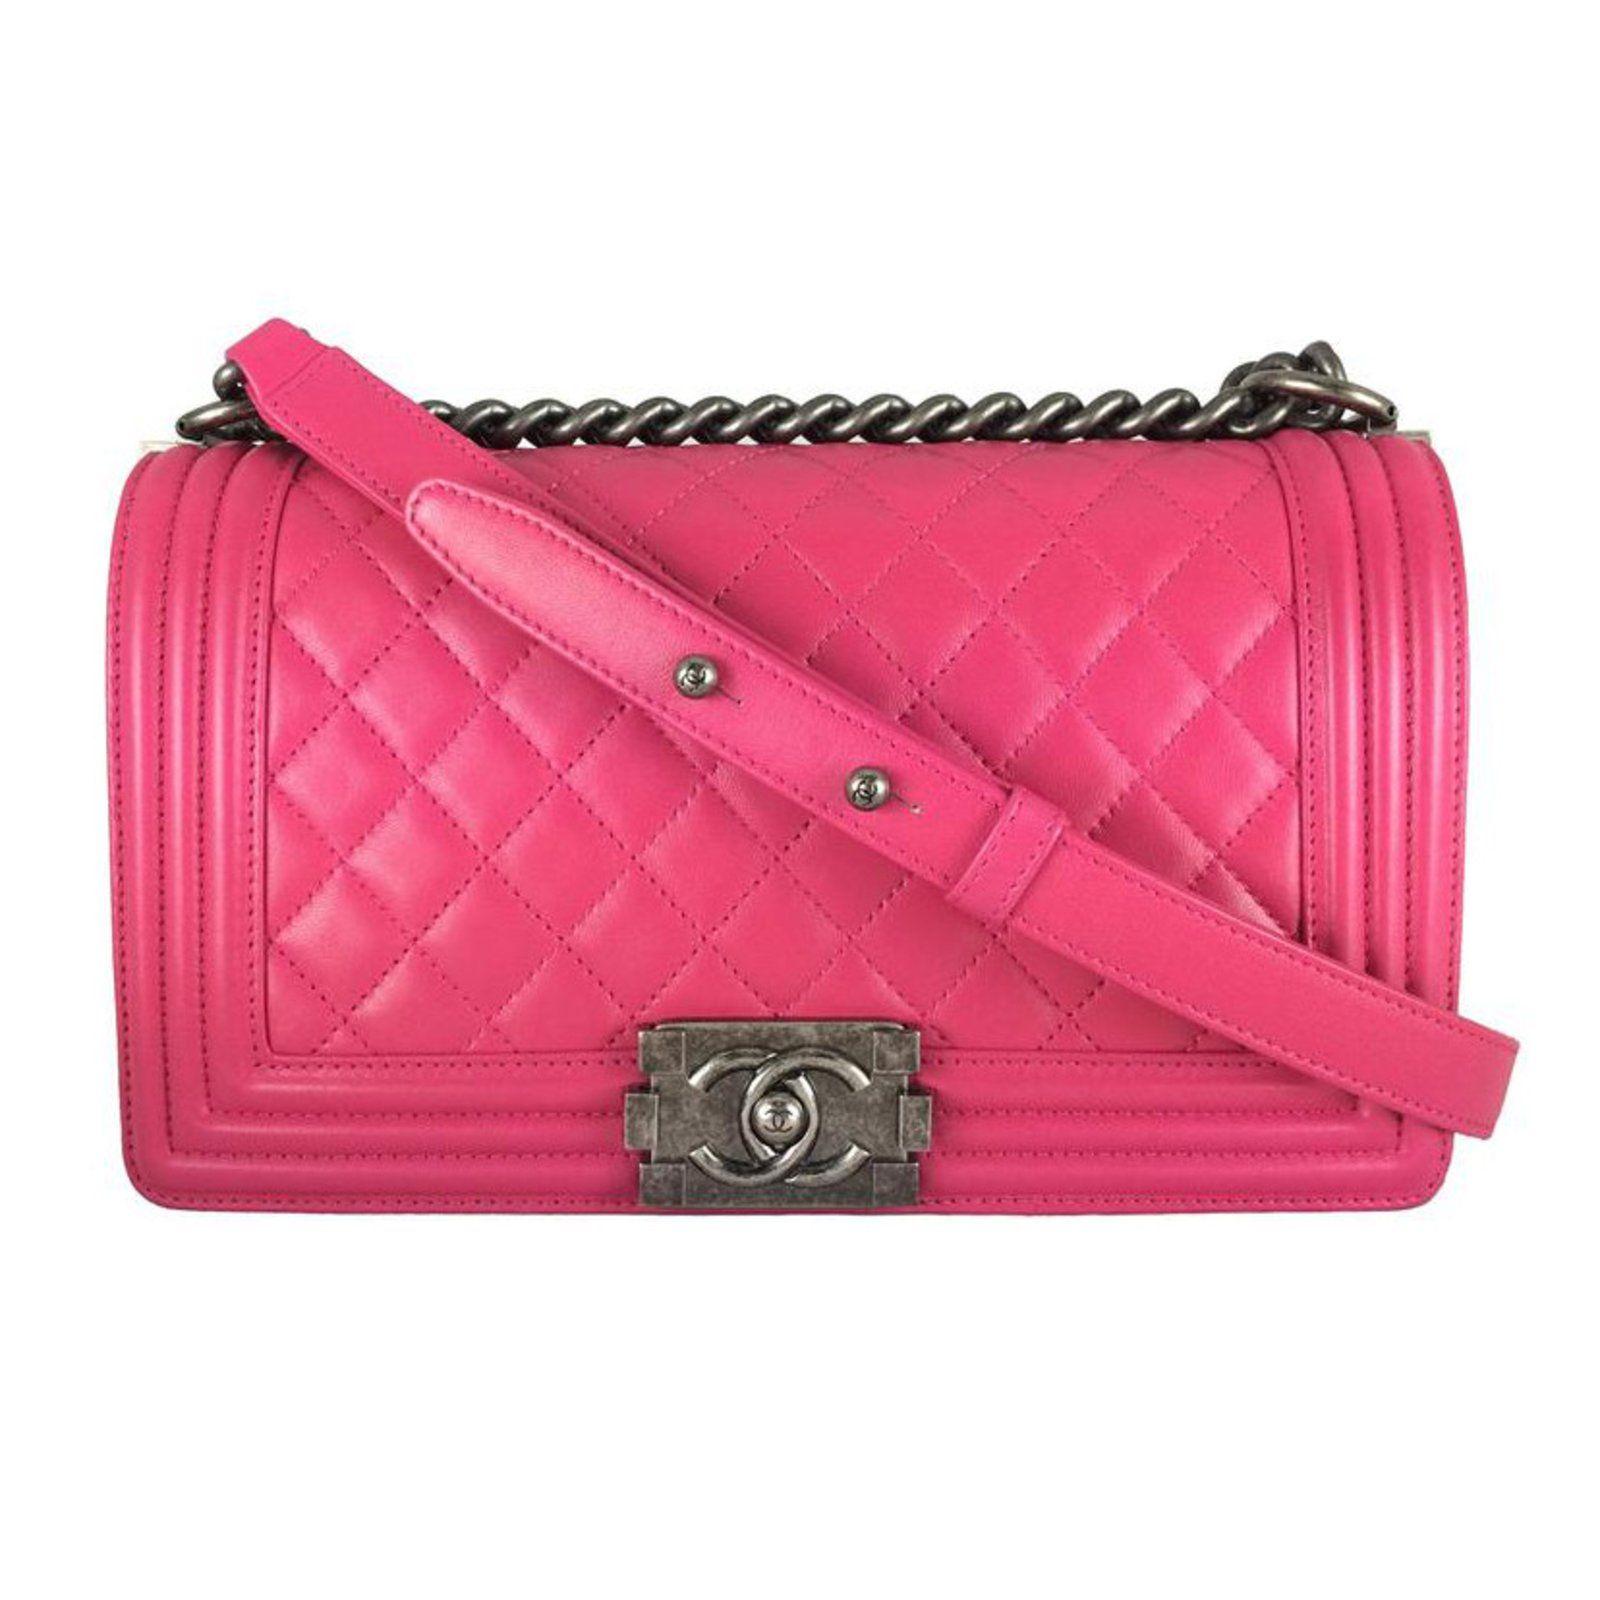 5887e9a47fdf73 Sacs à main Chanel Boy old medium Rose Cuir Rose ref.22764 - Joli Closet